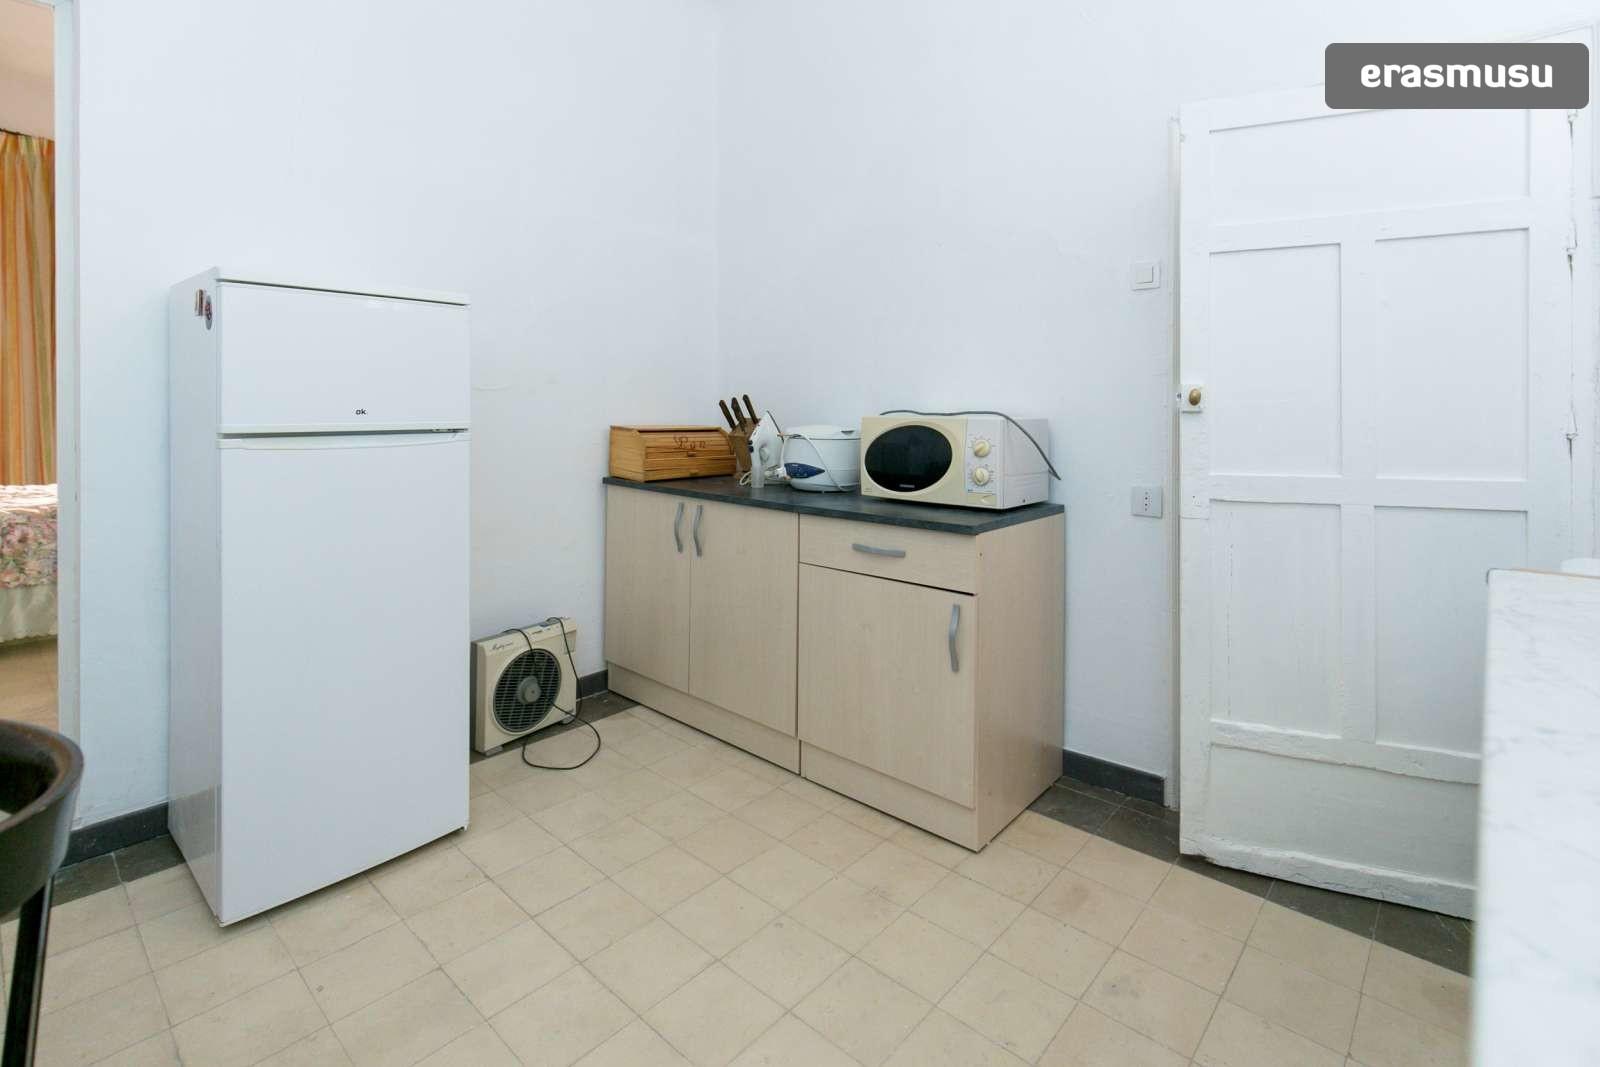 spacious-3-bedroom-apartment-rent-realejo-a5efe7f9a2943763116cdb